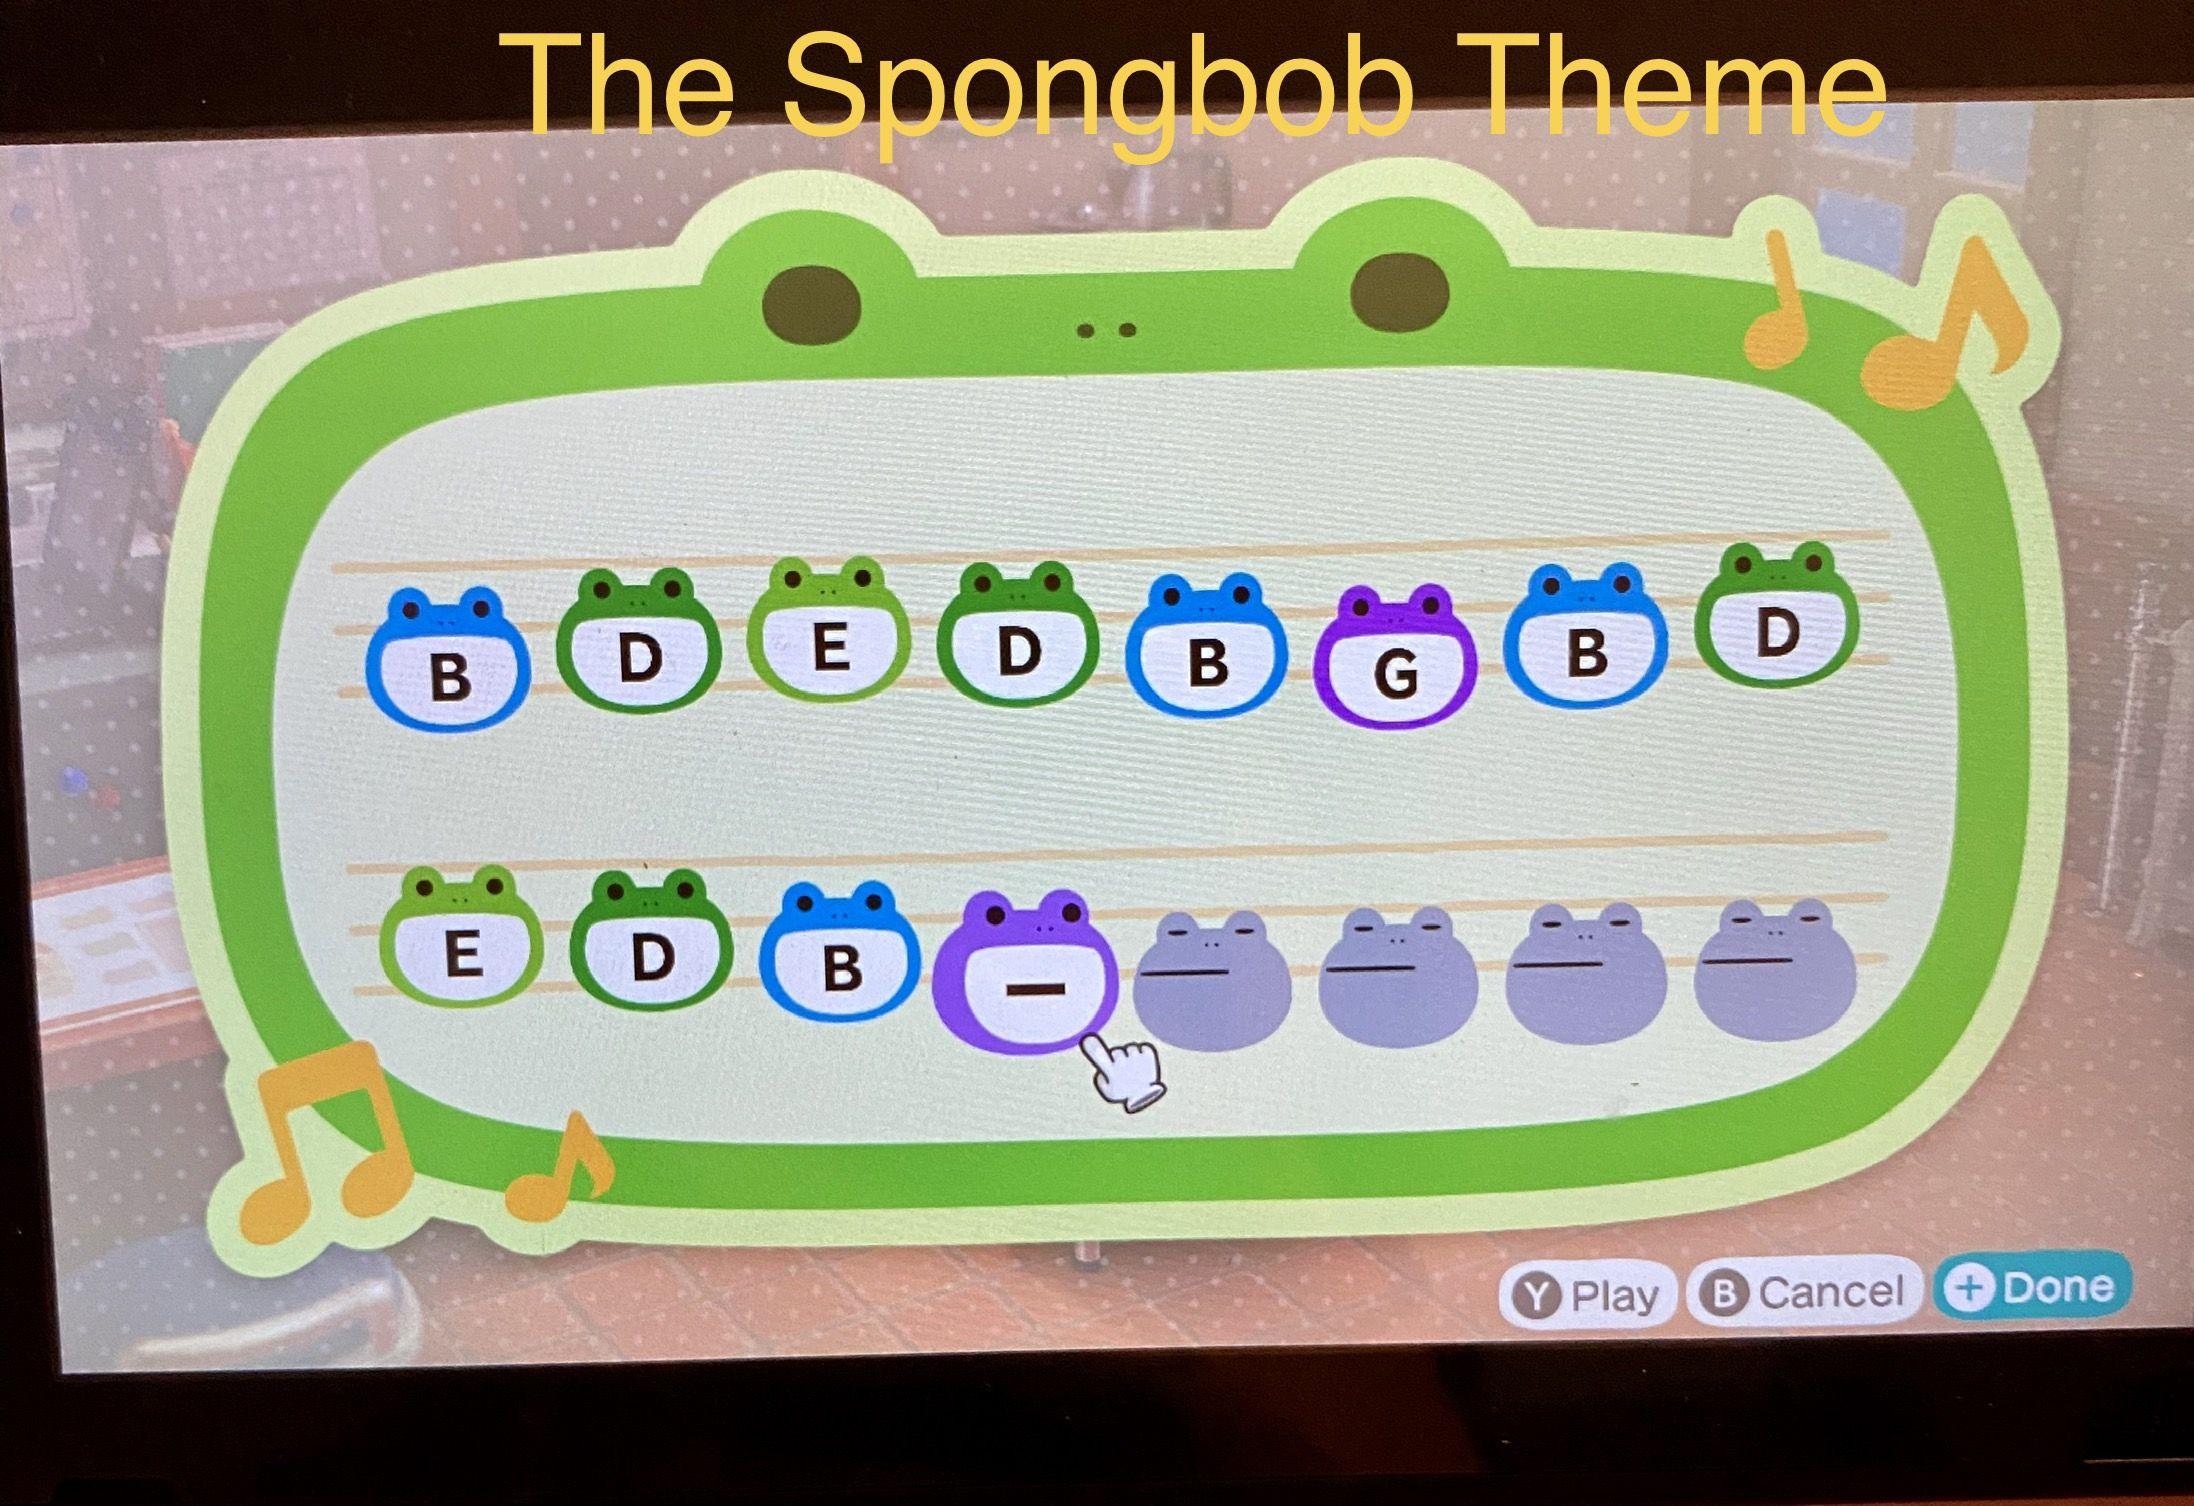 Animal Crossing New Horizons The Spongebob Theme In 2020 Animal Crossing Music Animal Crossing Town Tune Animal Crossing 3ds